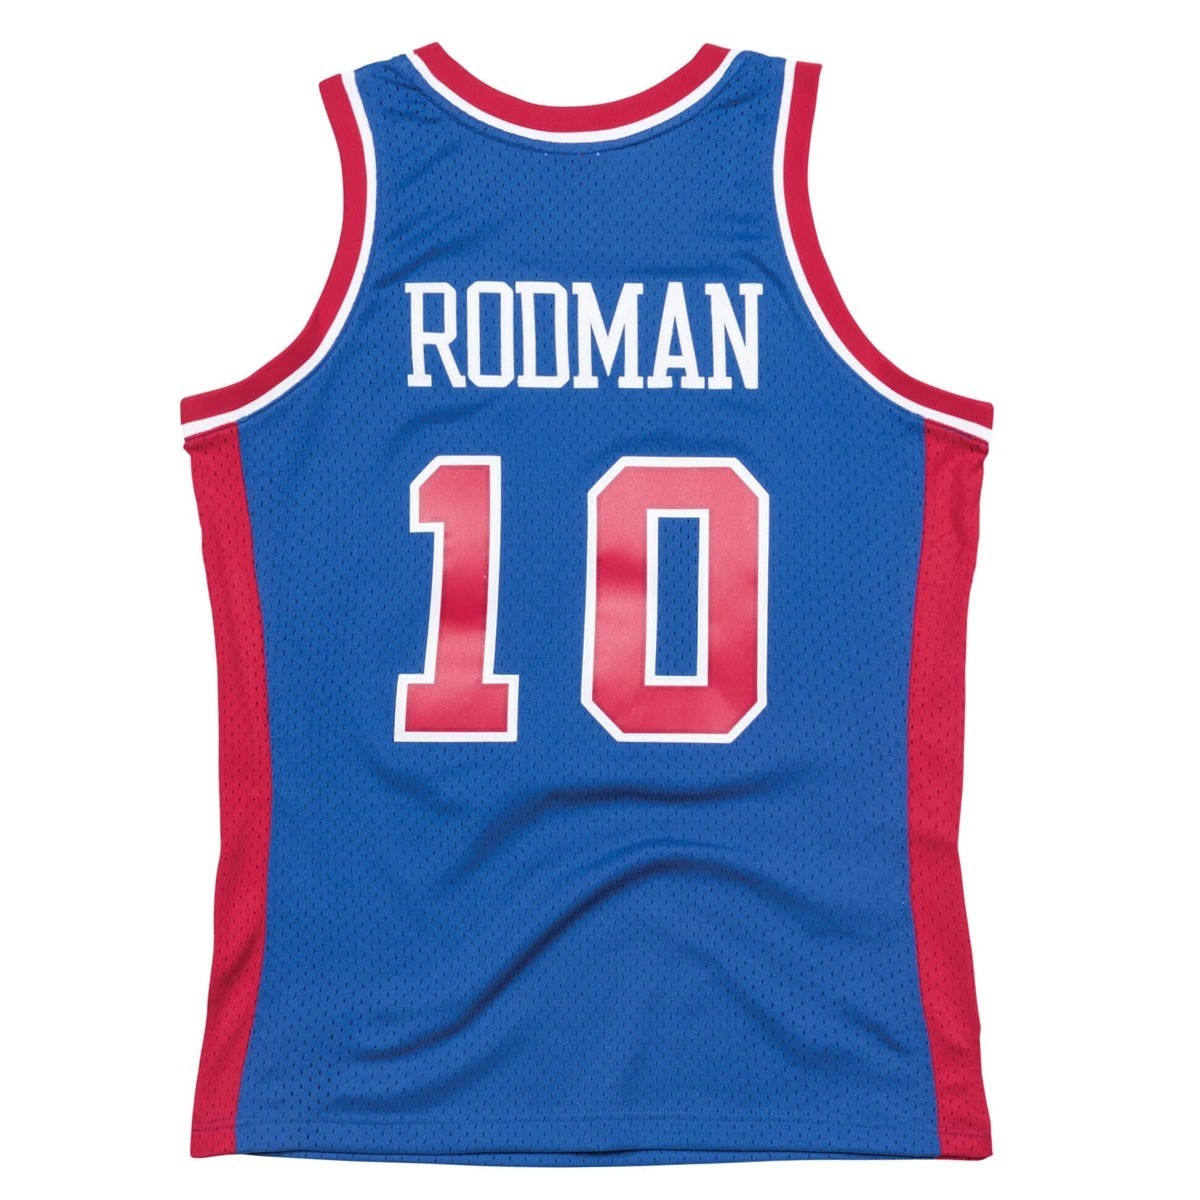 pretty nice aac12 e493a Mitchell & Ness Rodman Swingman Jersey Away 'Pistons'